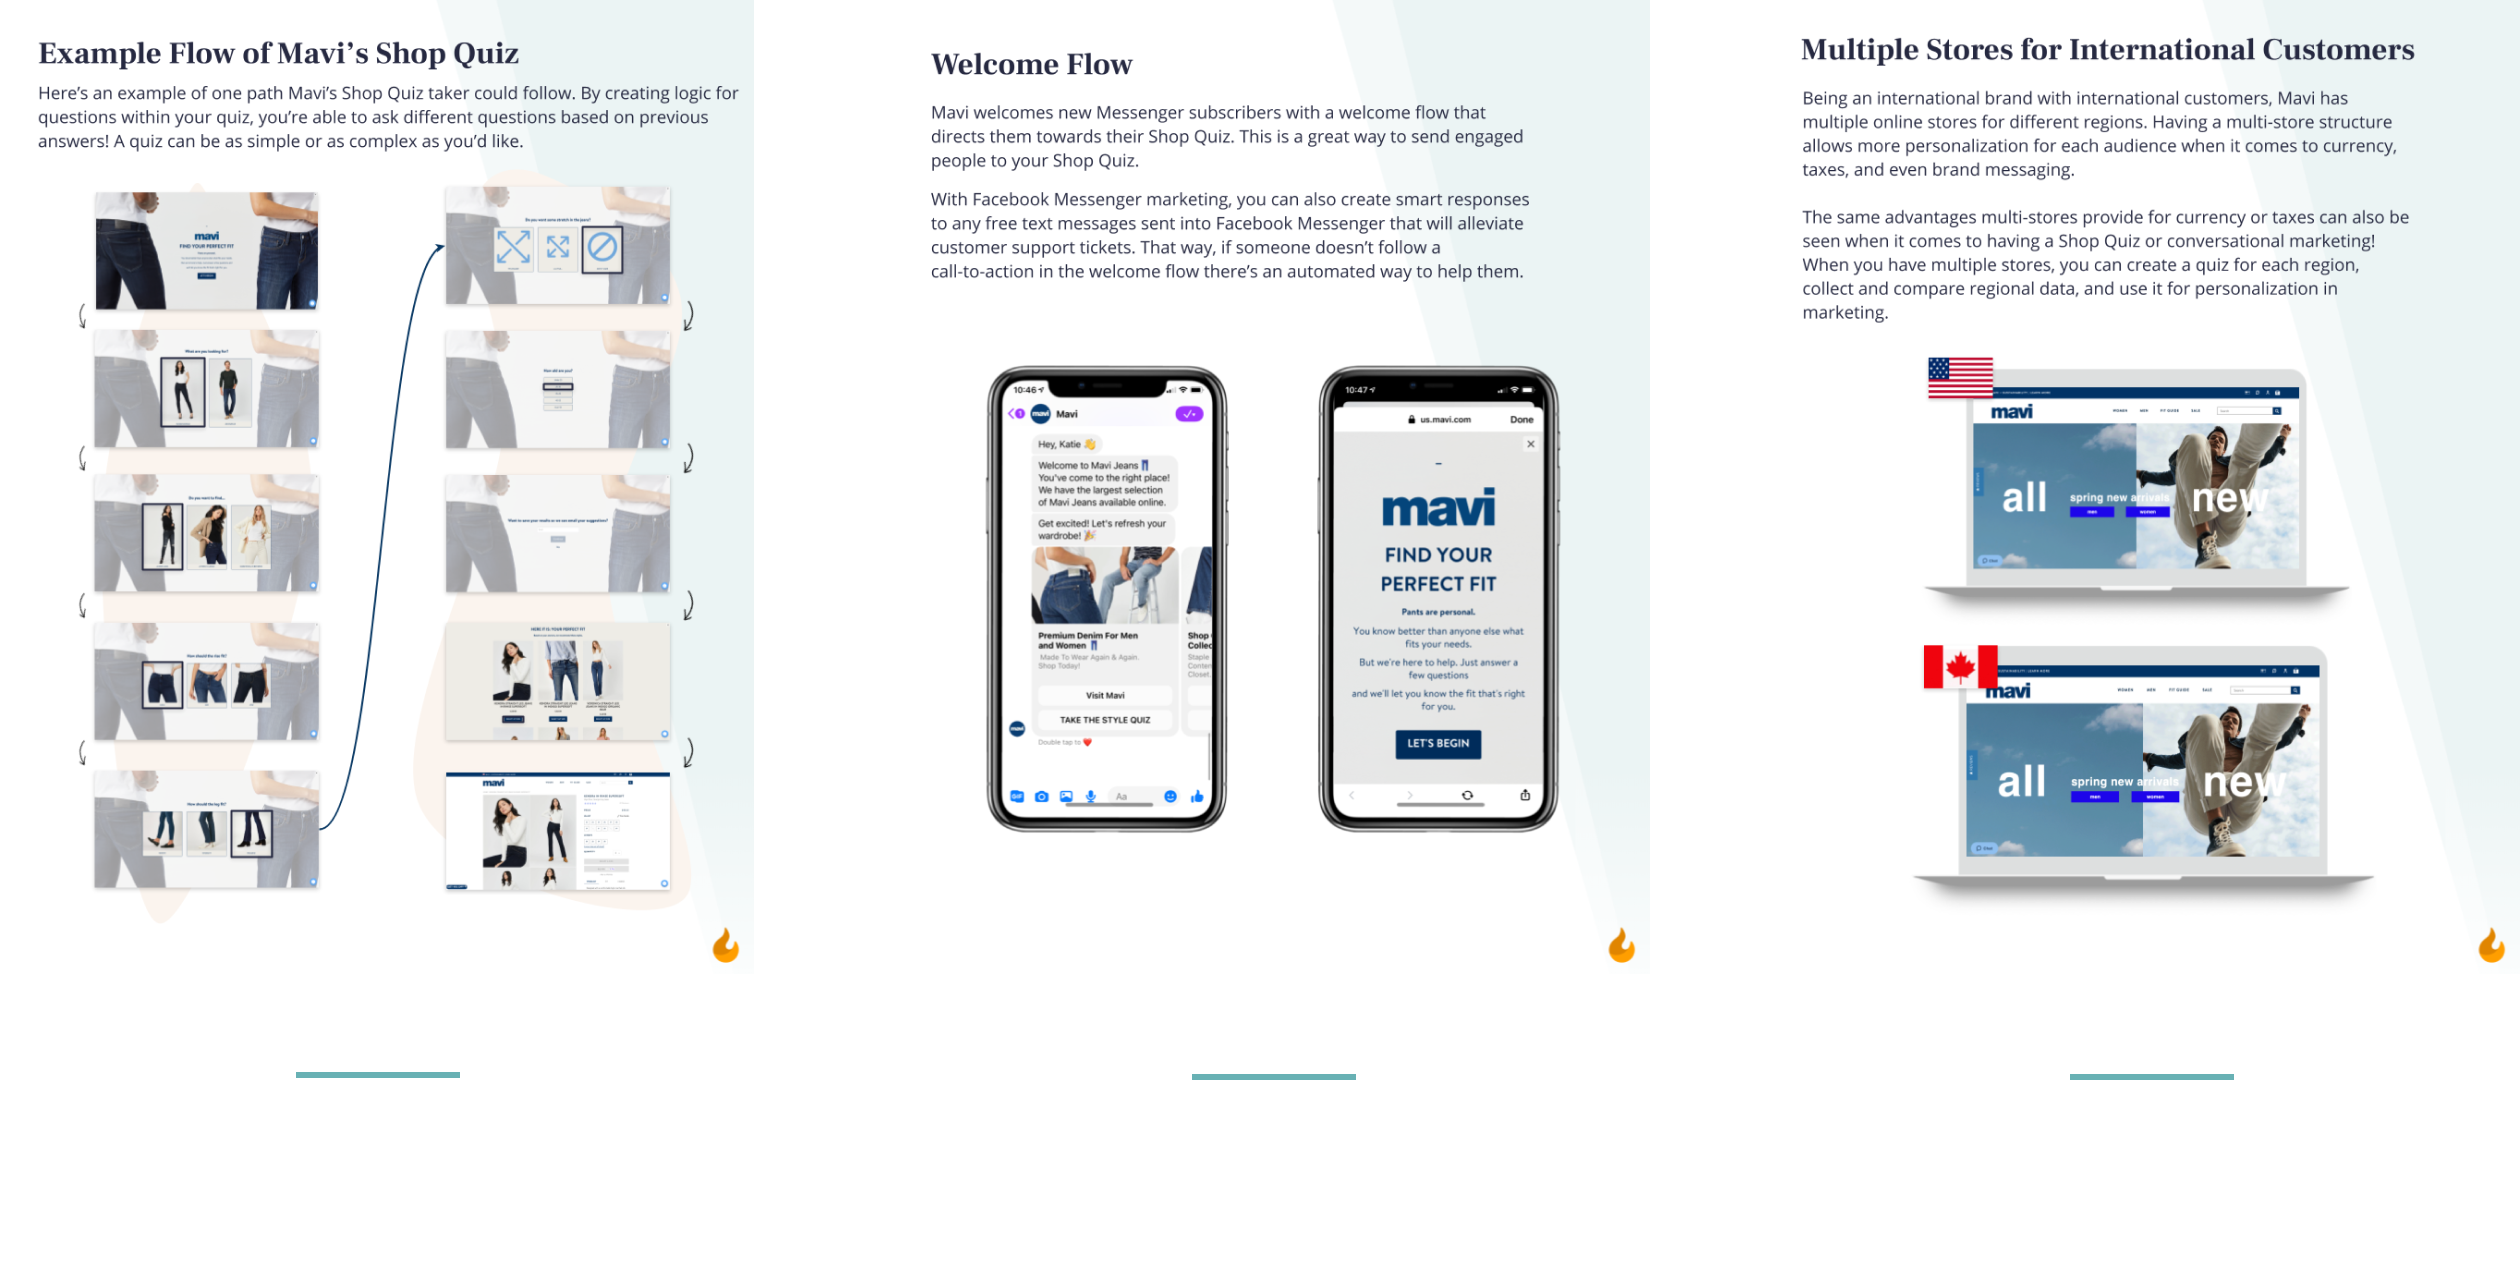 A Step-by-Step Walkthrough of Mavi Jean's DTC Marketing Strategy